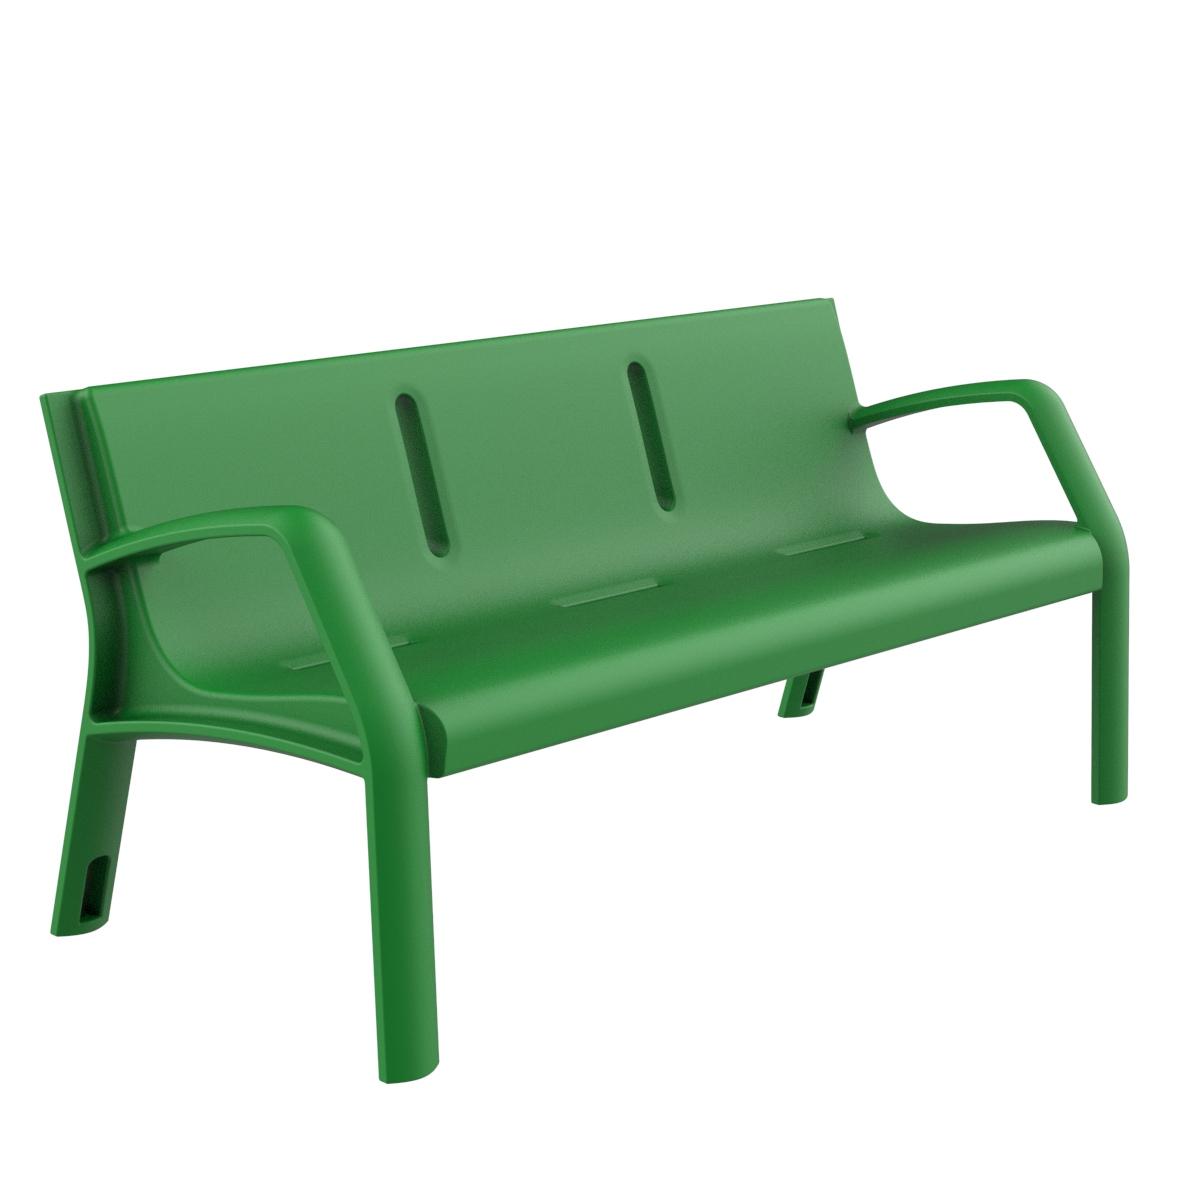 Banco plastico alvium mobiliario urbano para sentarse - Imagenes de bancos para sentarse ...